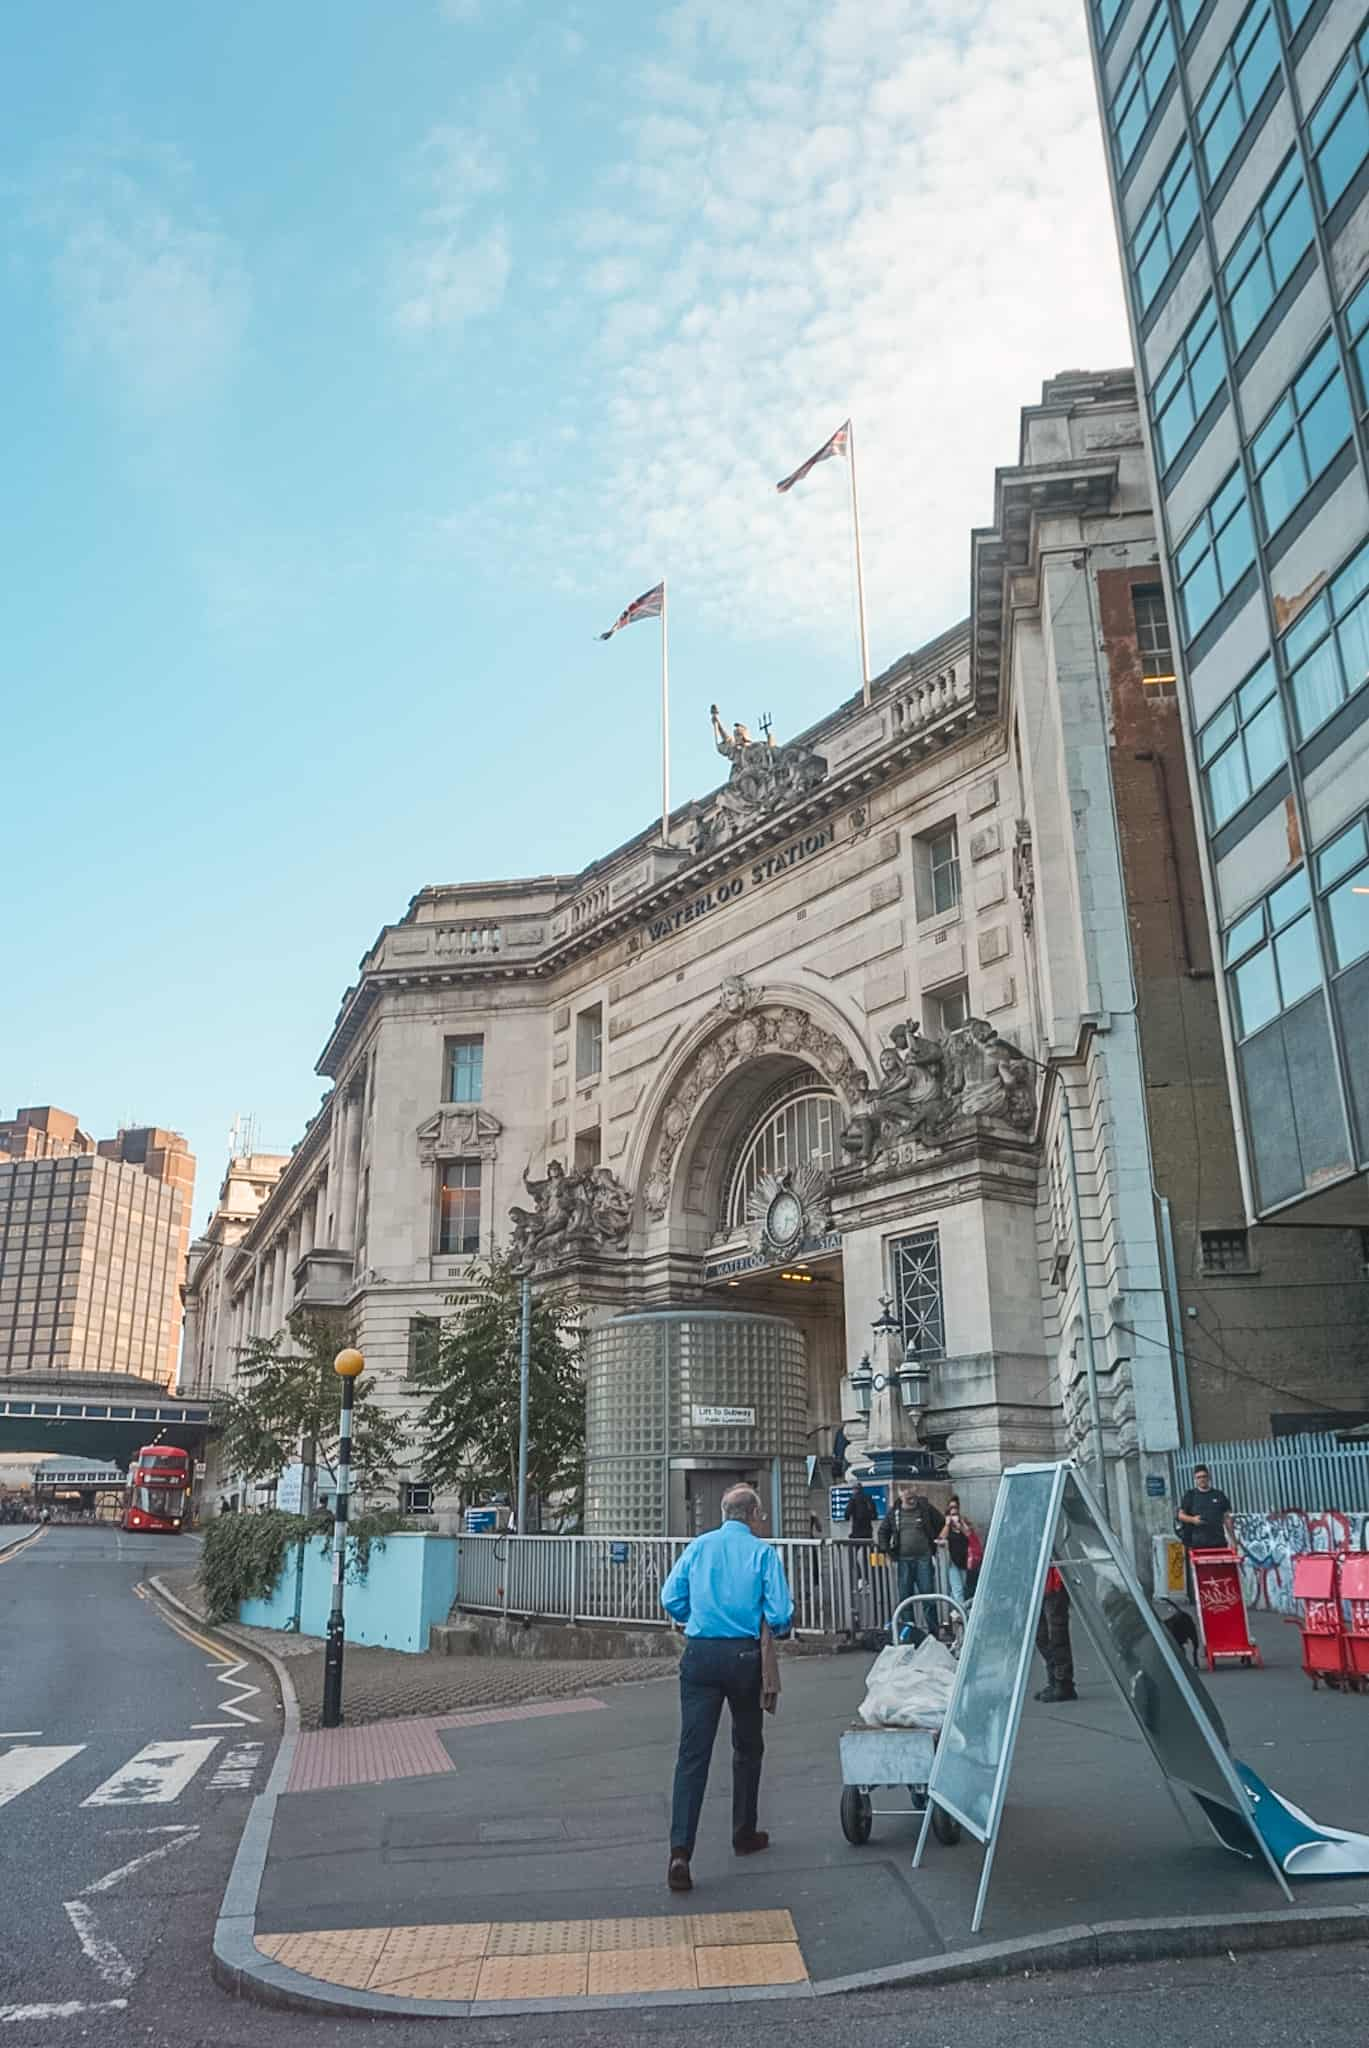 Waterloo Station: Starting Point Self Guided Walking Tour London